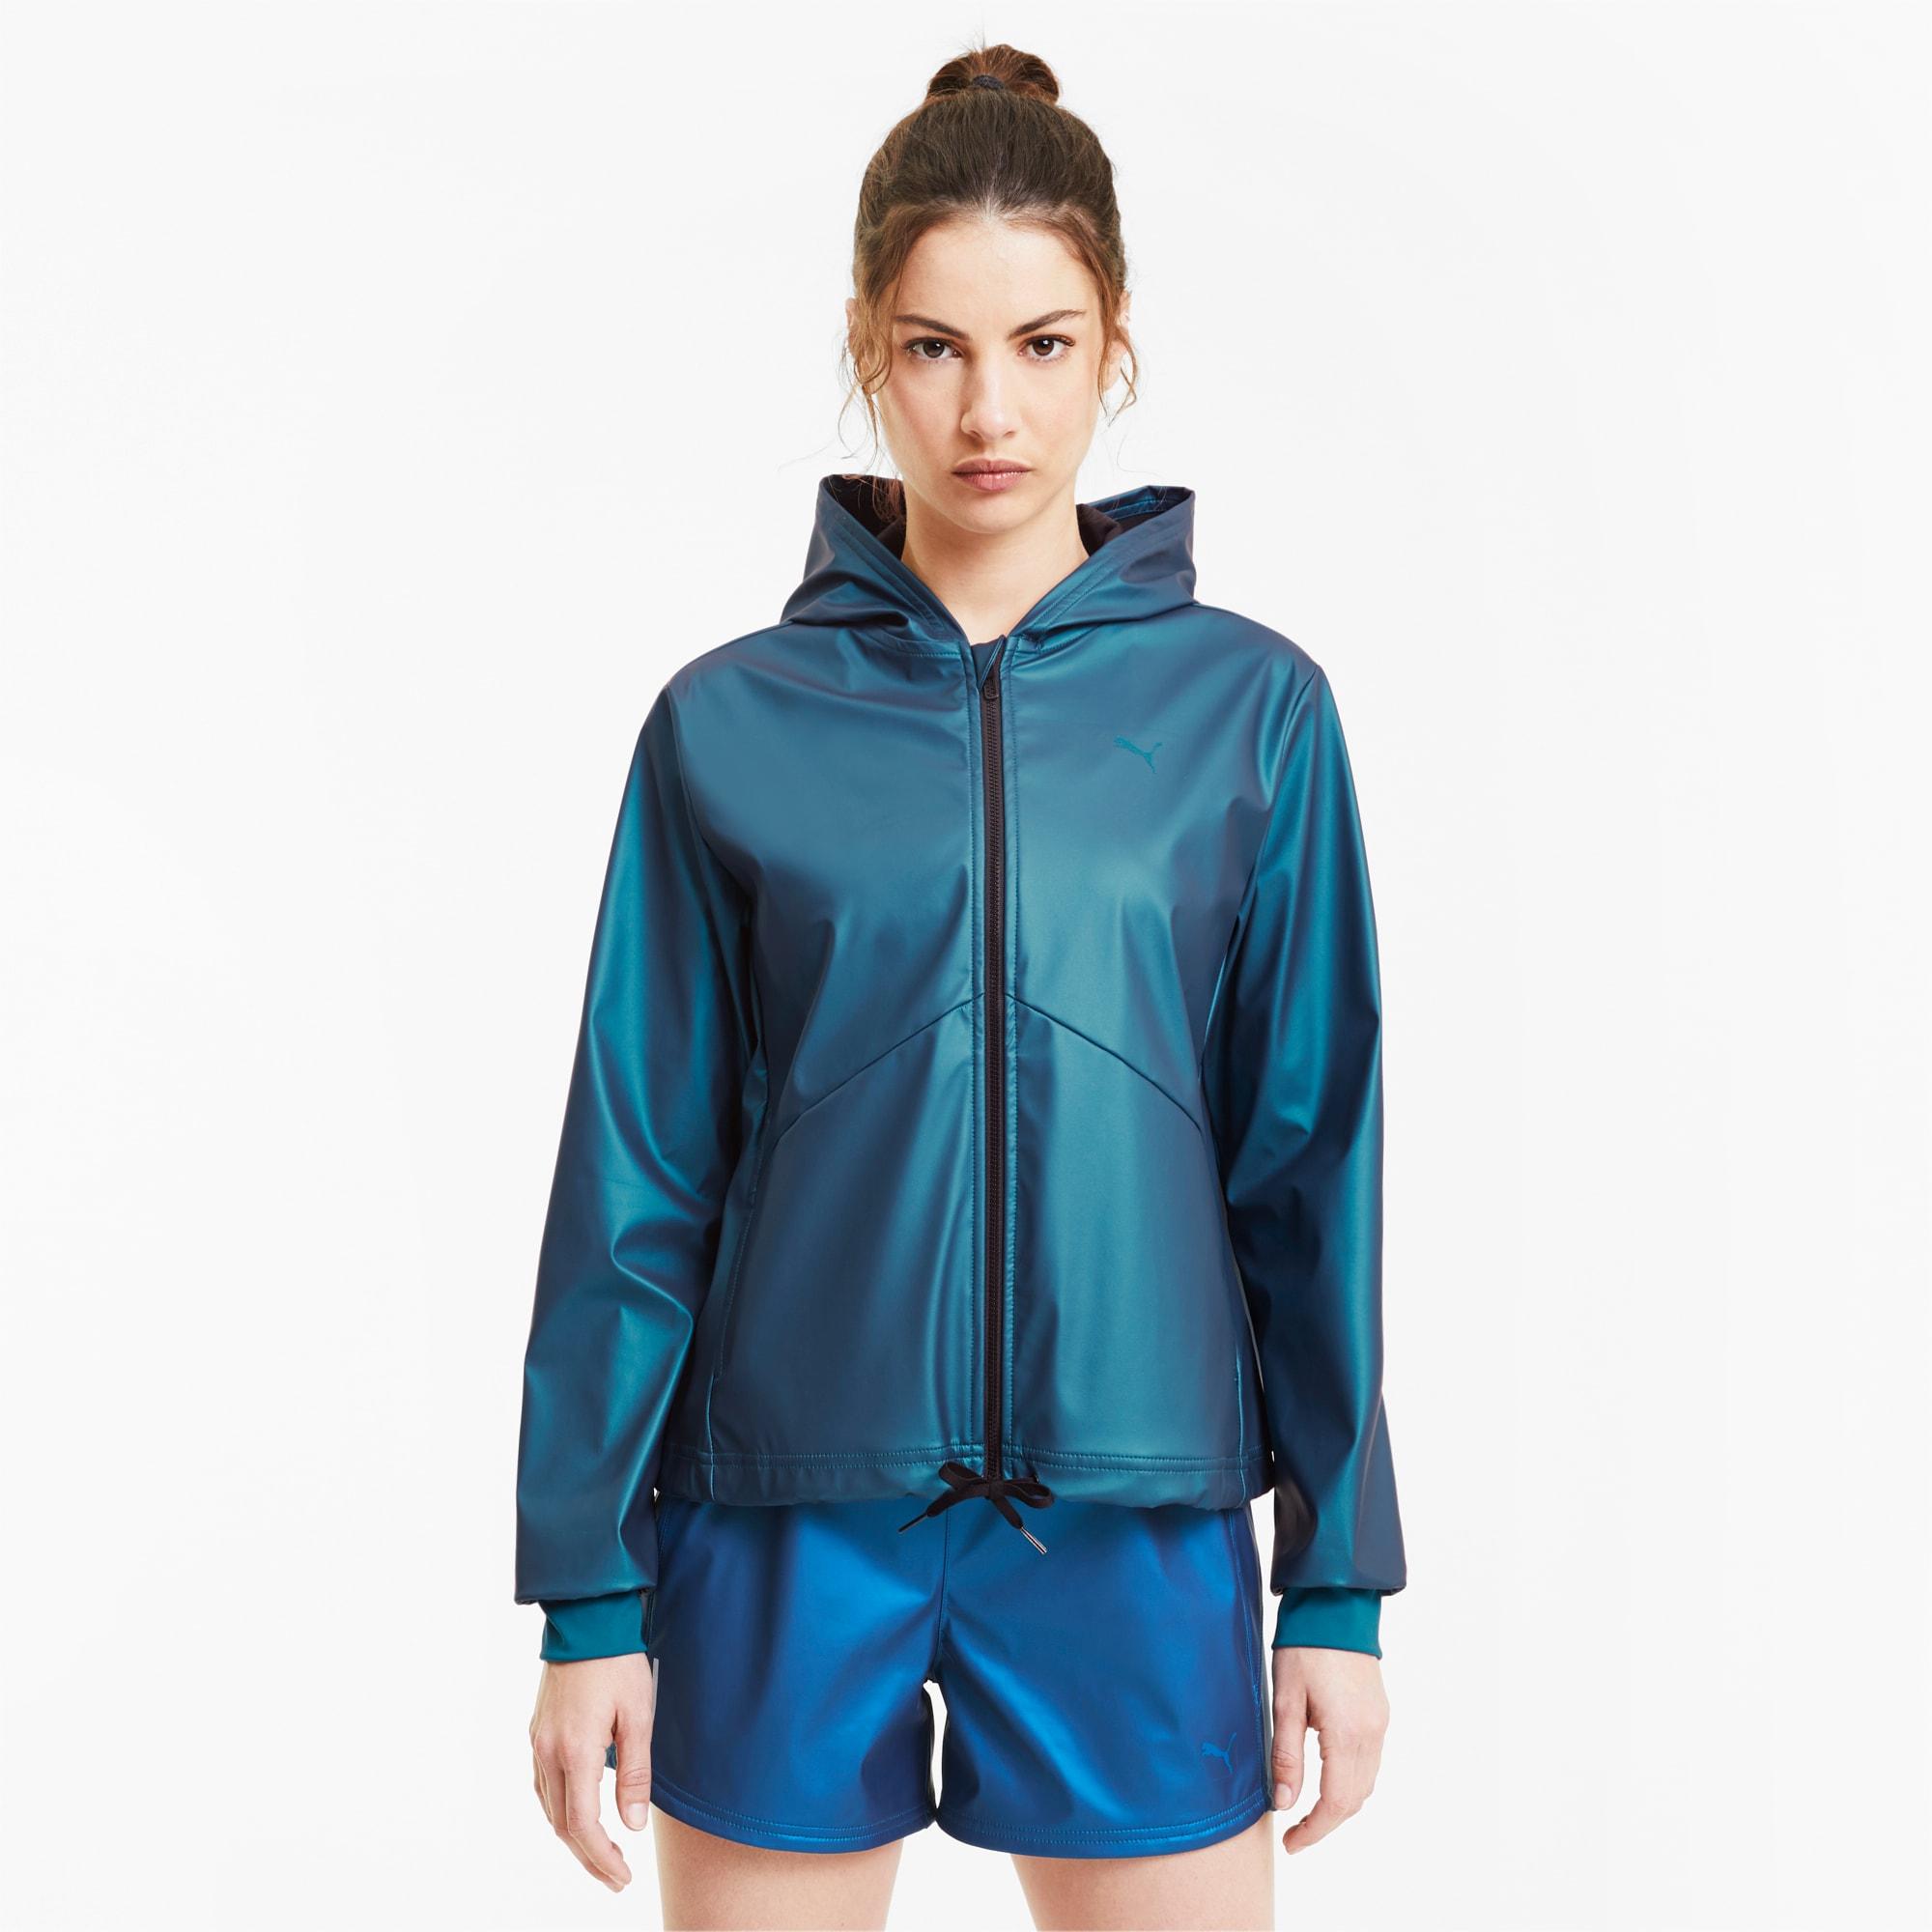 puma Warm-Up Shimmer Hooded trainingsjack voor Dames, BlauwS